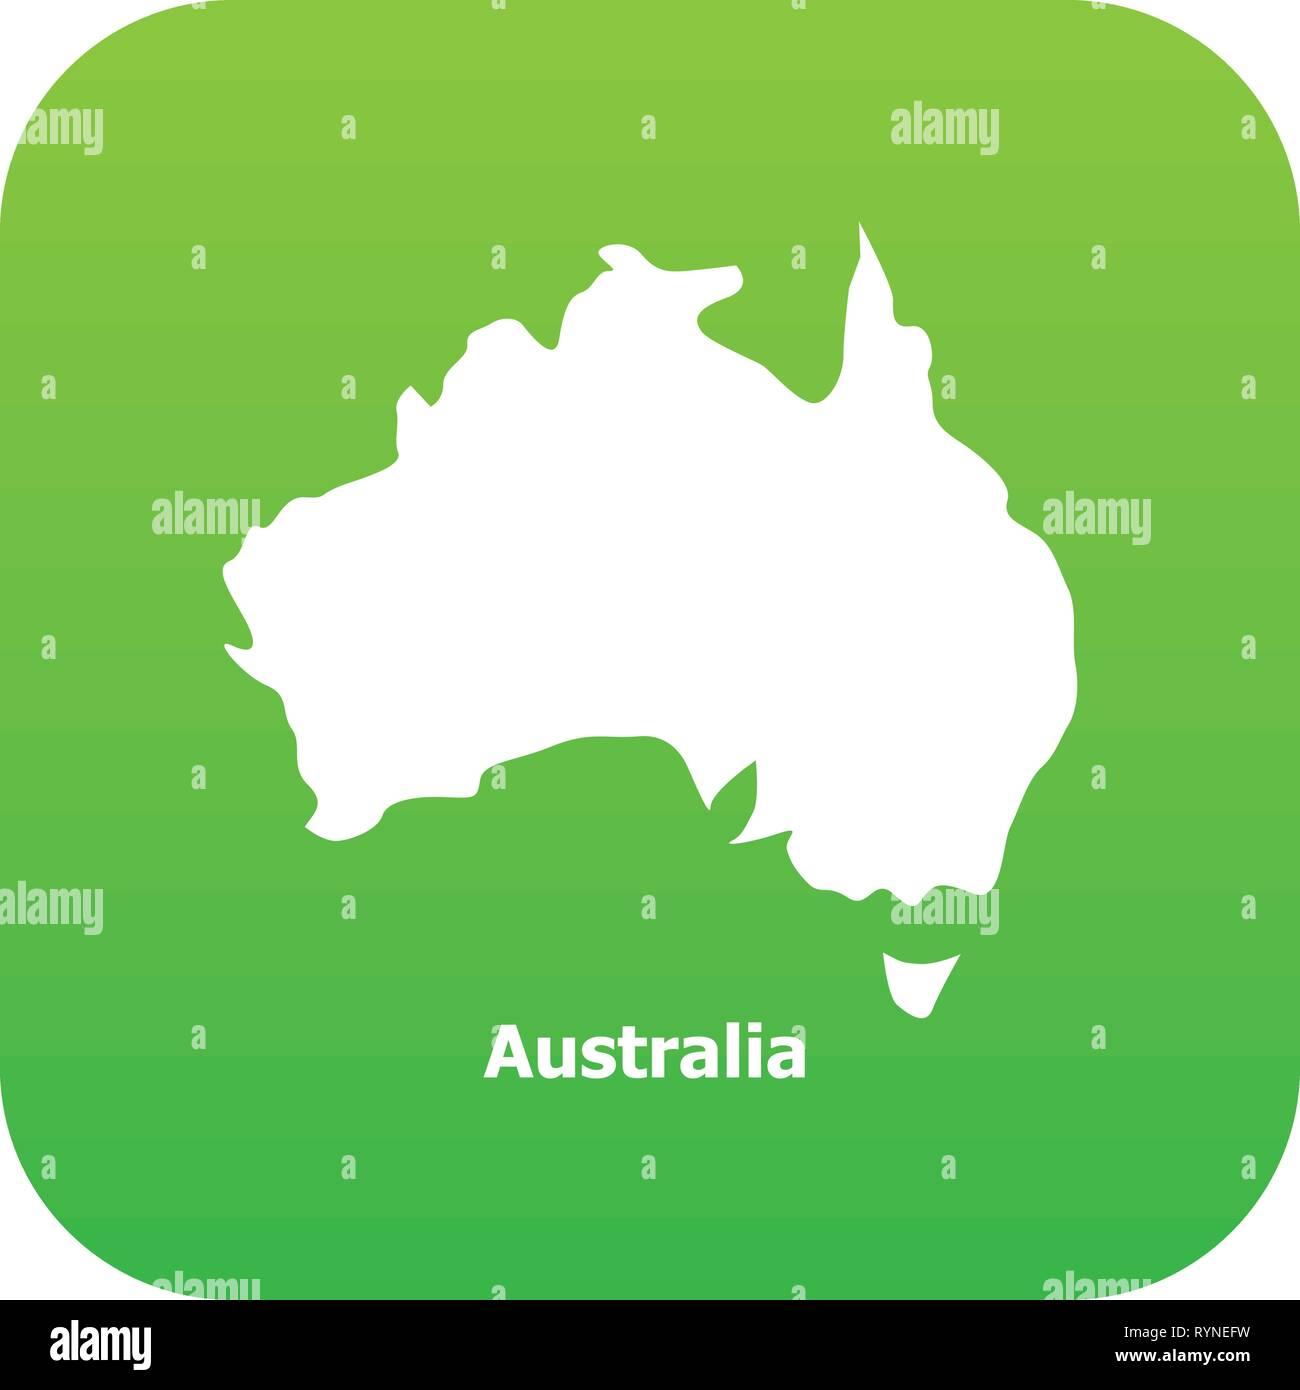 Australia Map Icon.Australia Map Icon Simple Style Stock Vector Art Illustration